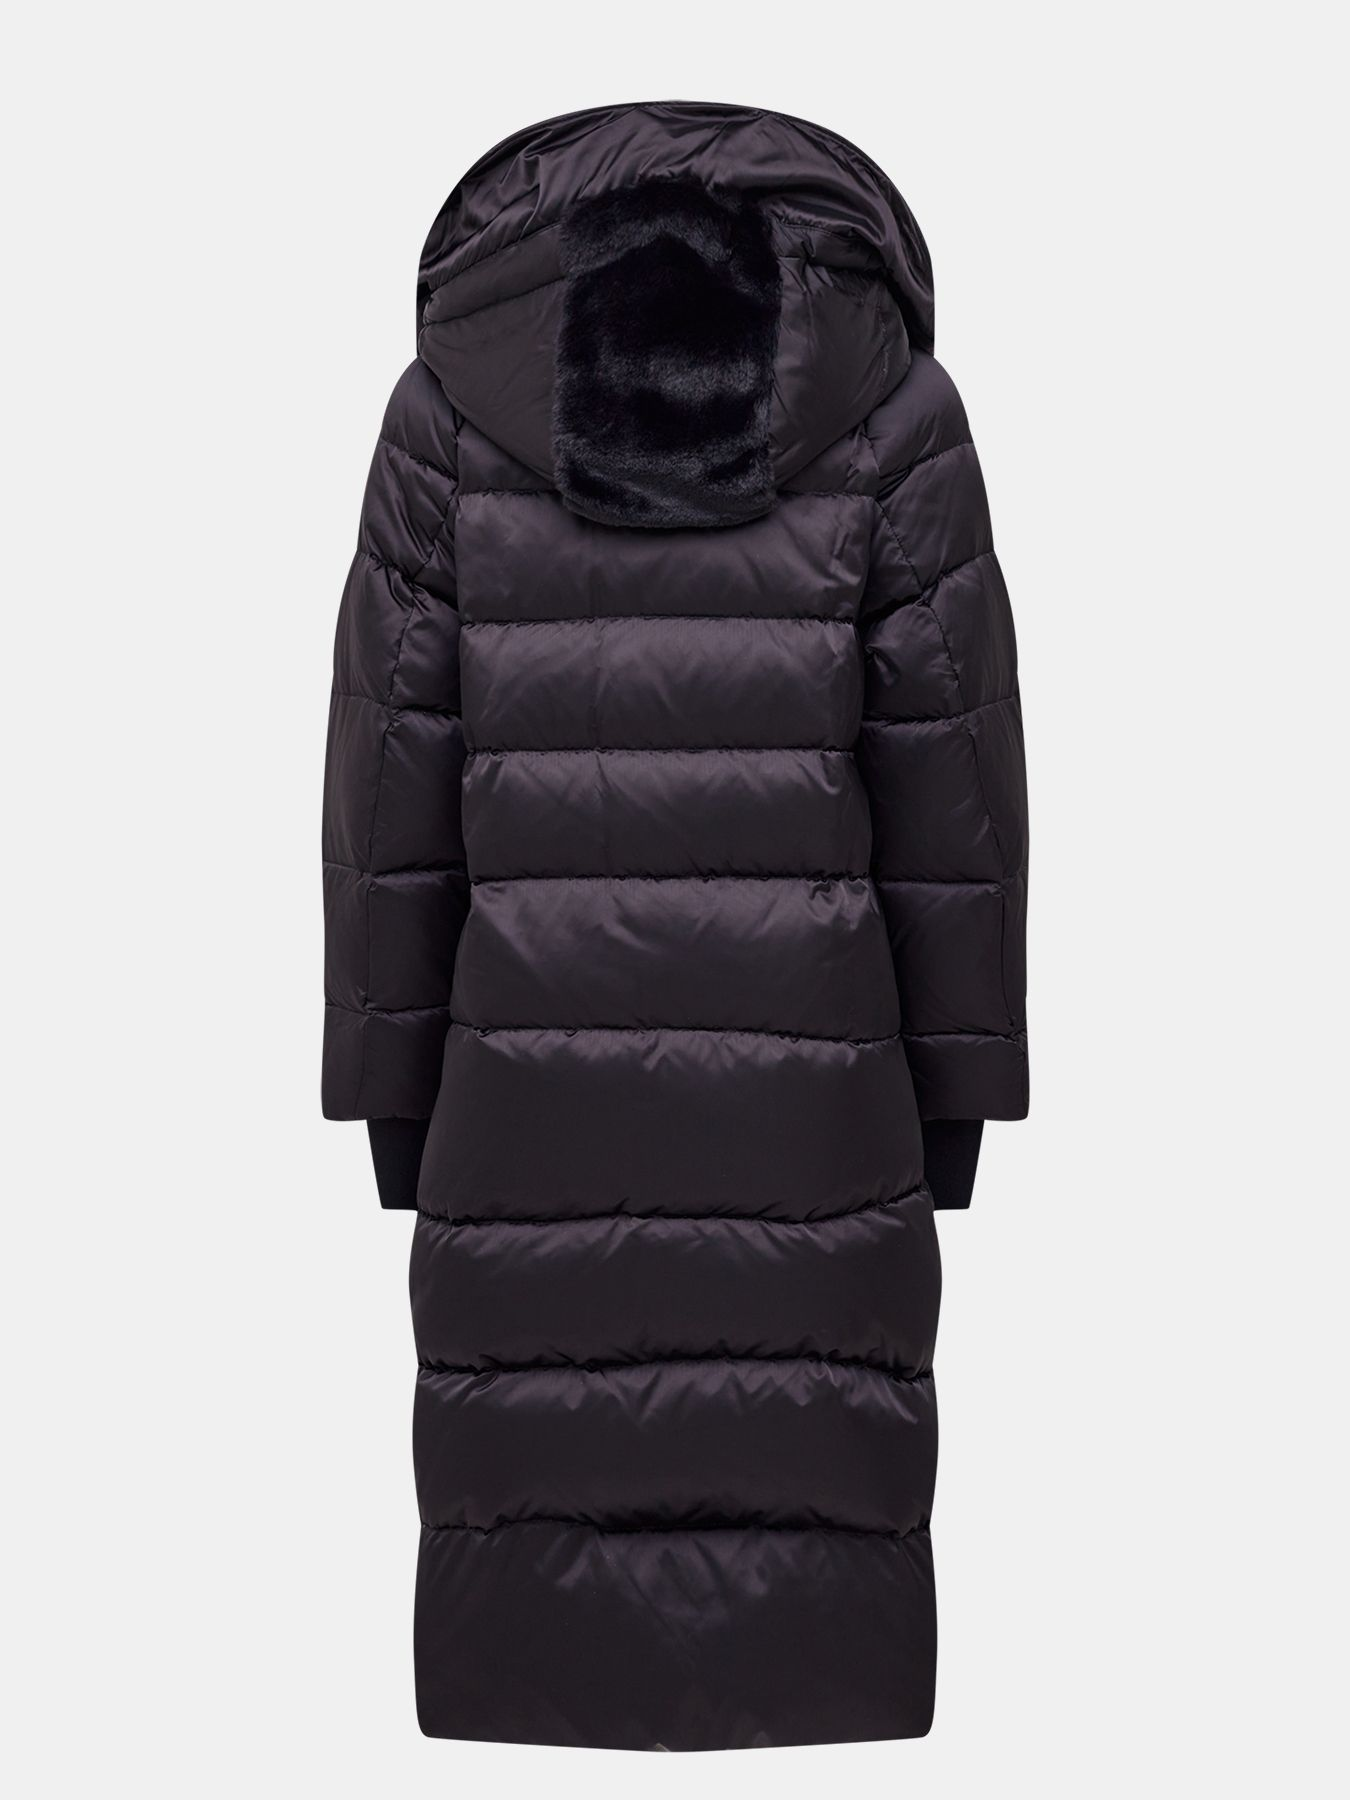 Пальто Patrizia Pepe Удлиненная куртка куртка patrizia pepe 8l0210 a2hs k103